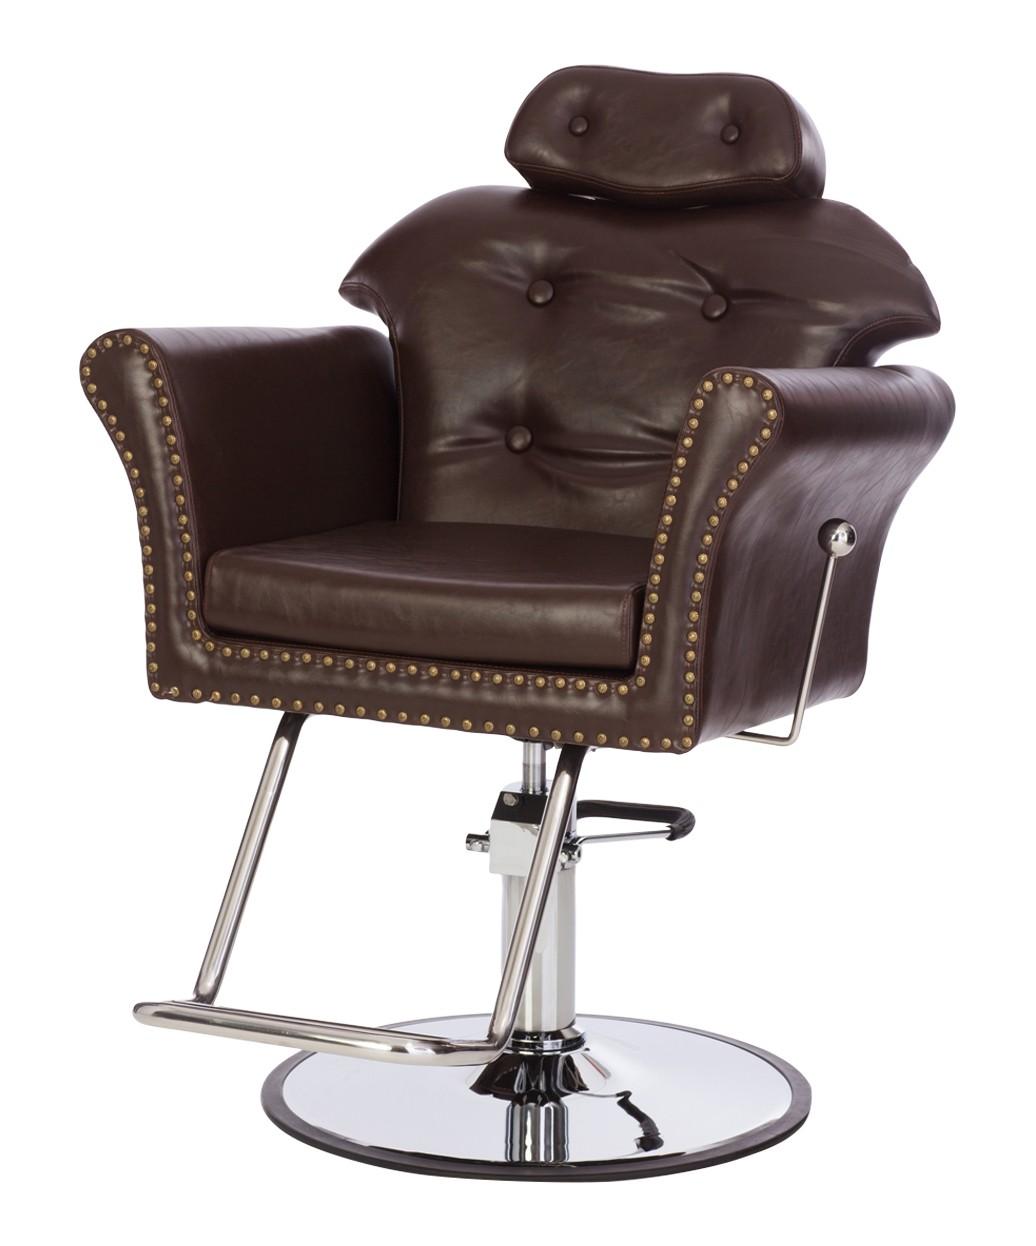 Gramercy All Purpose Chair  sc 1 st  Buy-Rite Beauty & All-Purpose Salon Chairs: Facial Waxing u0026 Threading Chairs islam-shia.org